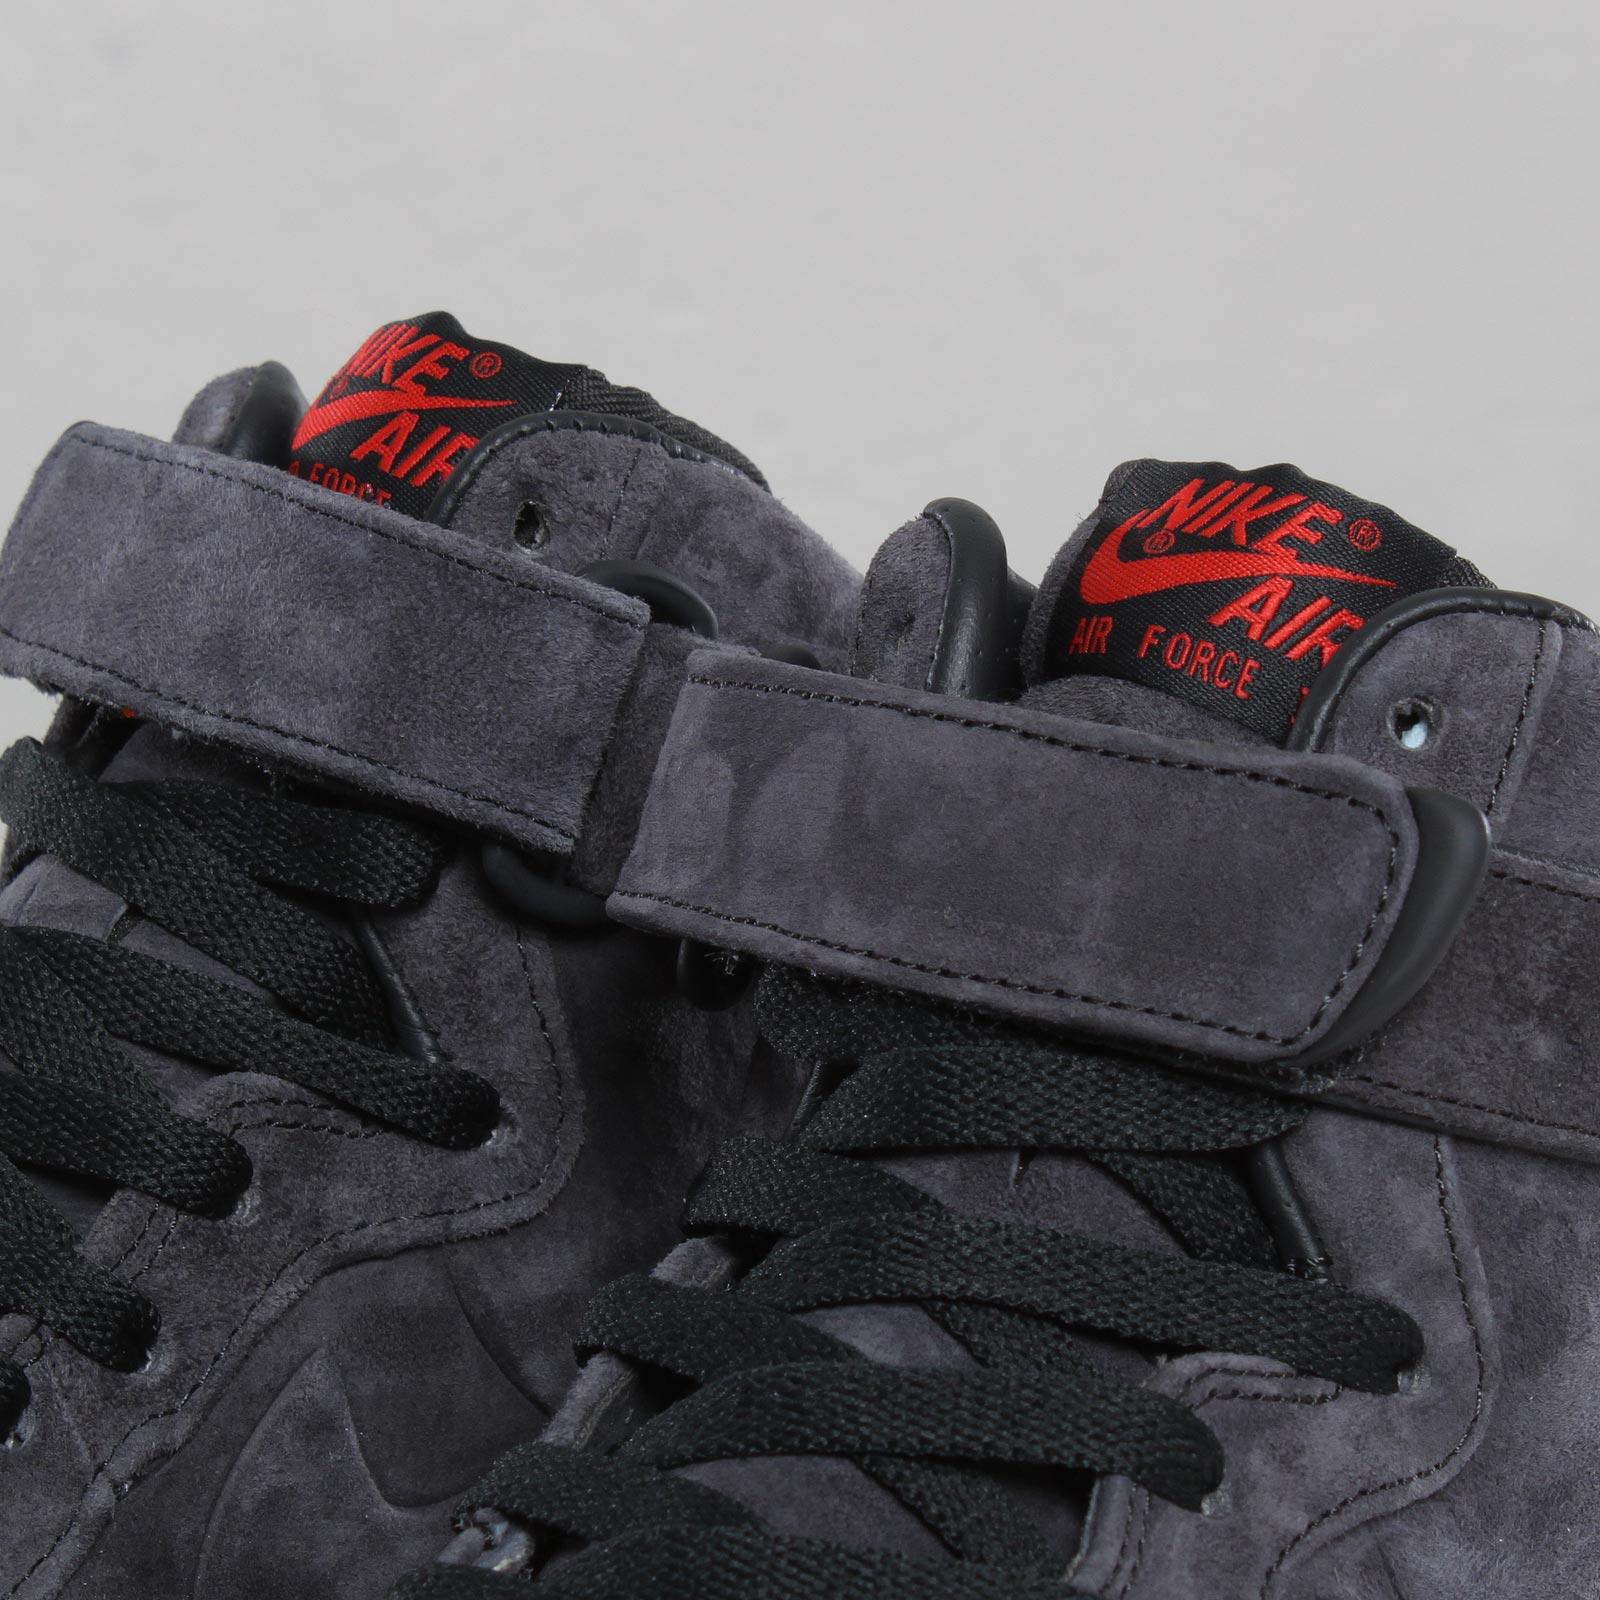 Prm SneakersnstuffSneakers Nike Air 1 Vt 102809 High Force gvmf7ybIY6